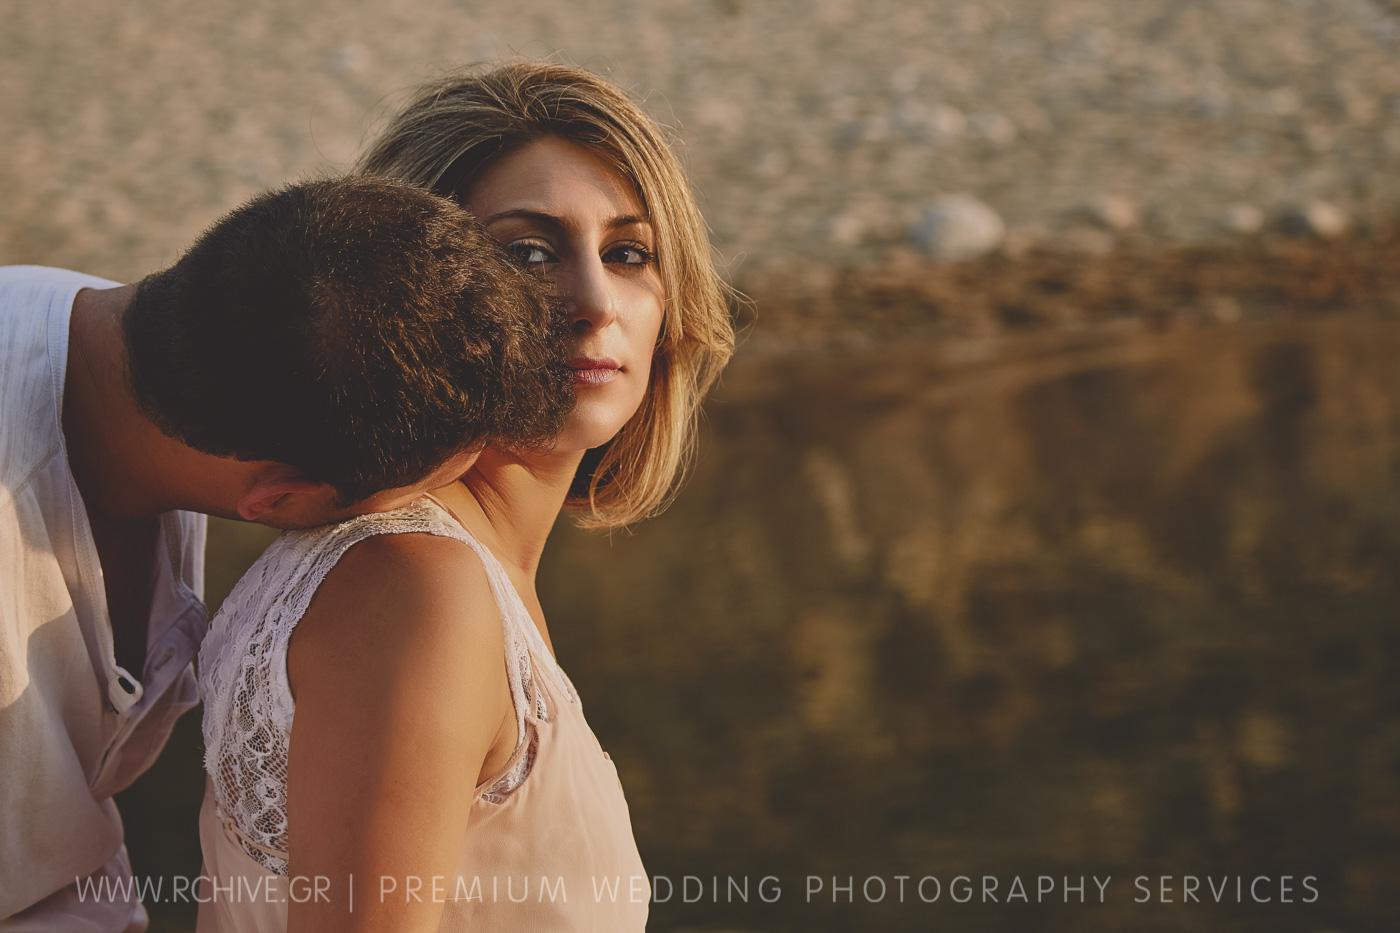 portrait photographer greece